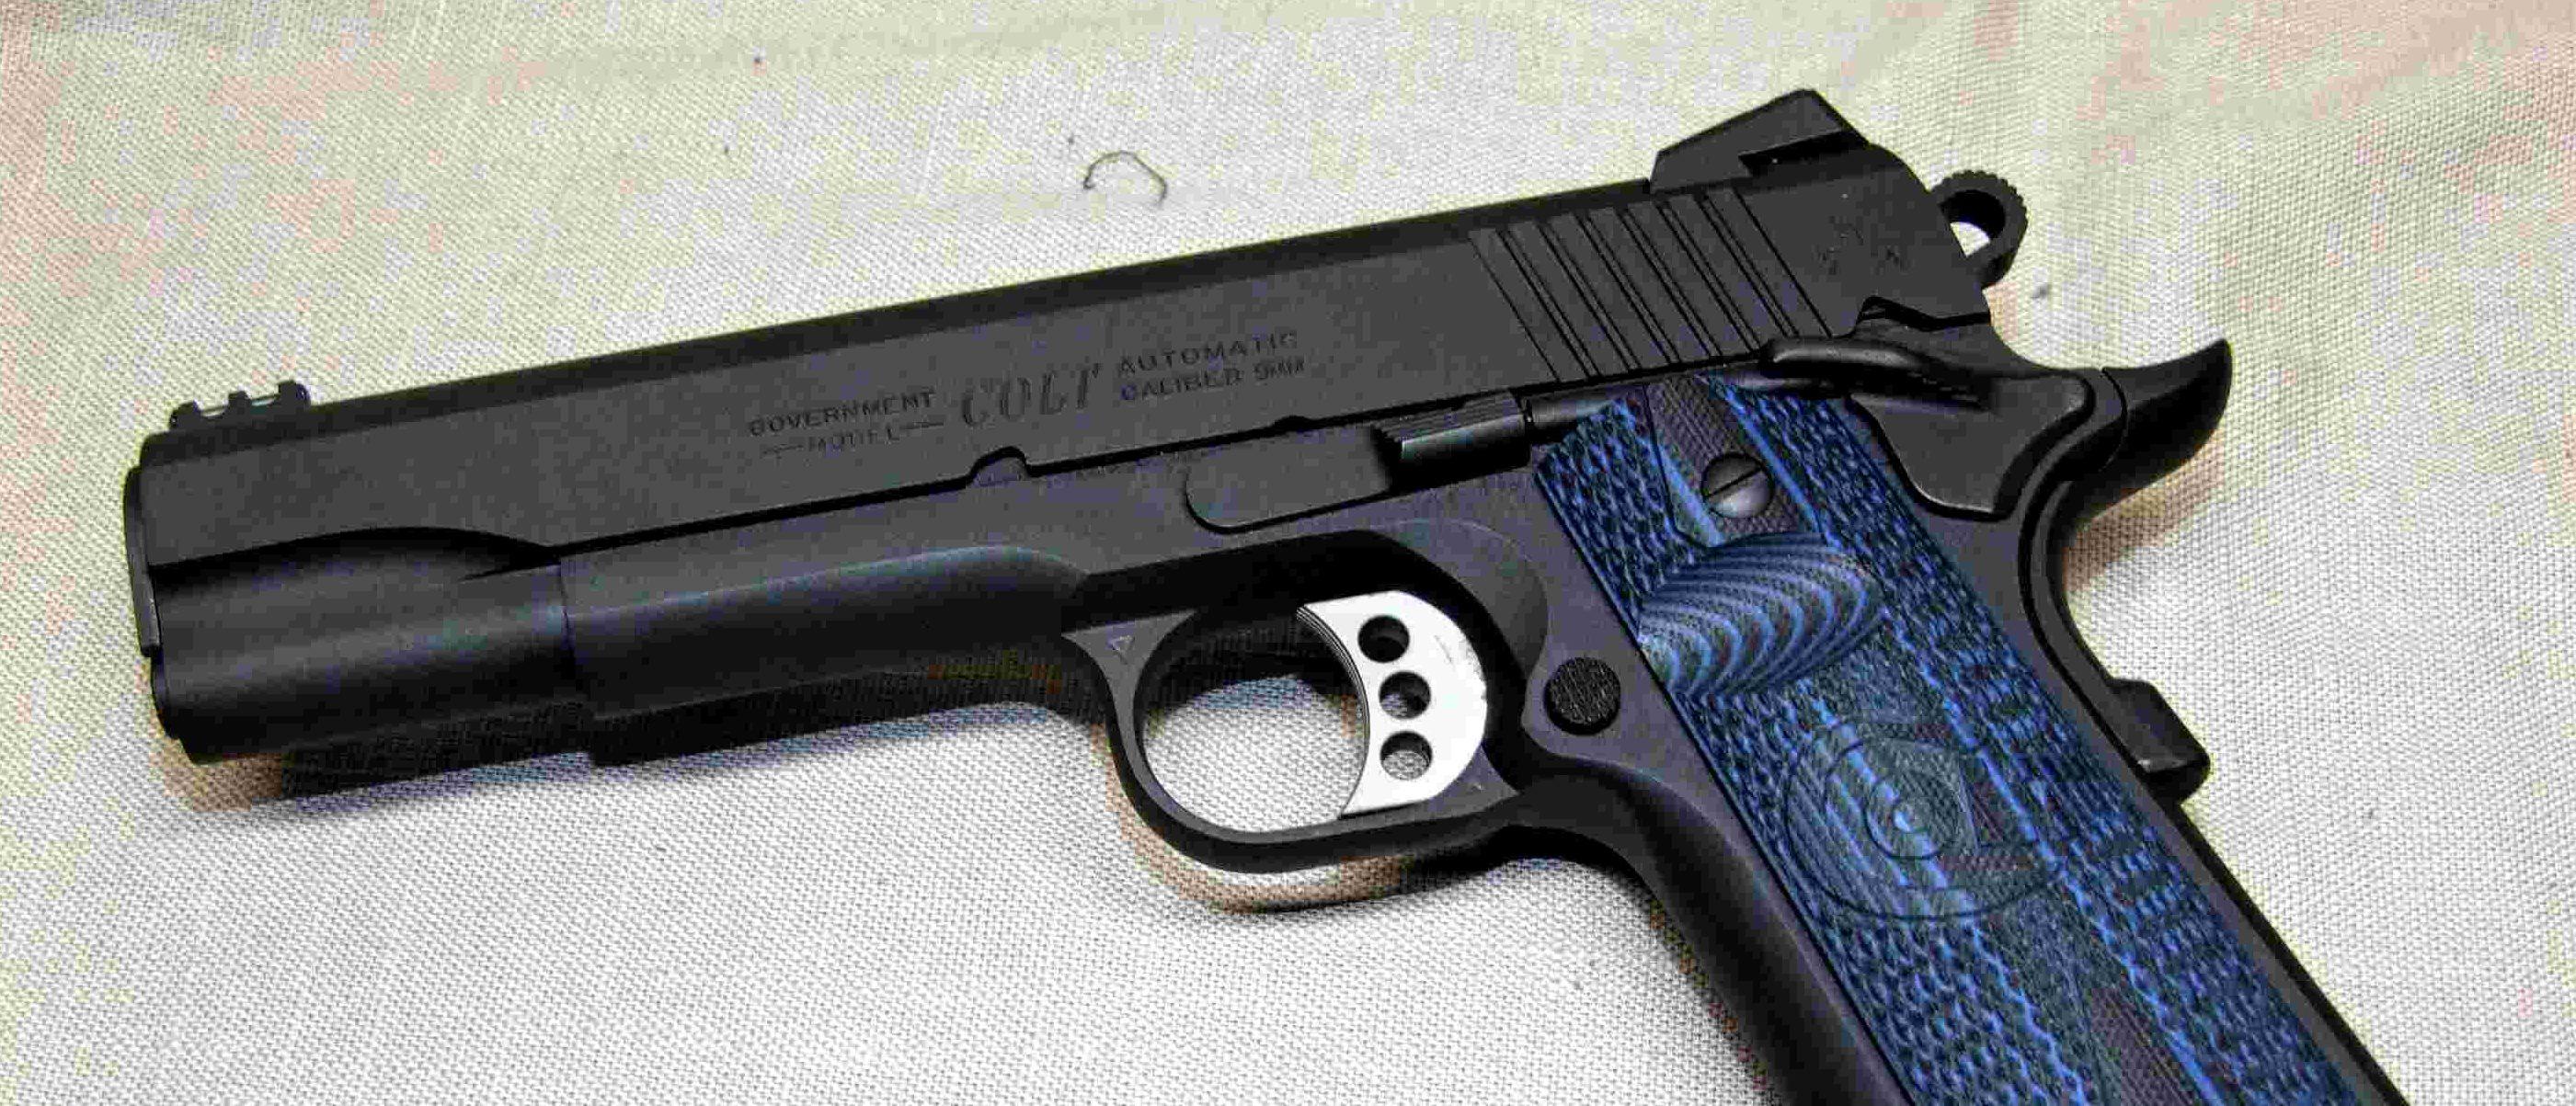 Gun Test Colt Competition Pistol The Daily Caller Model 1911a1 Parts Diagram